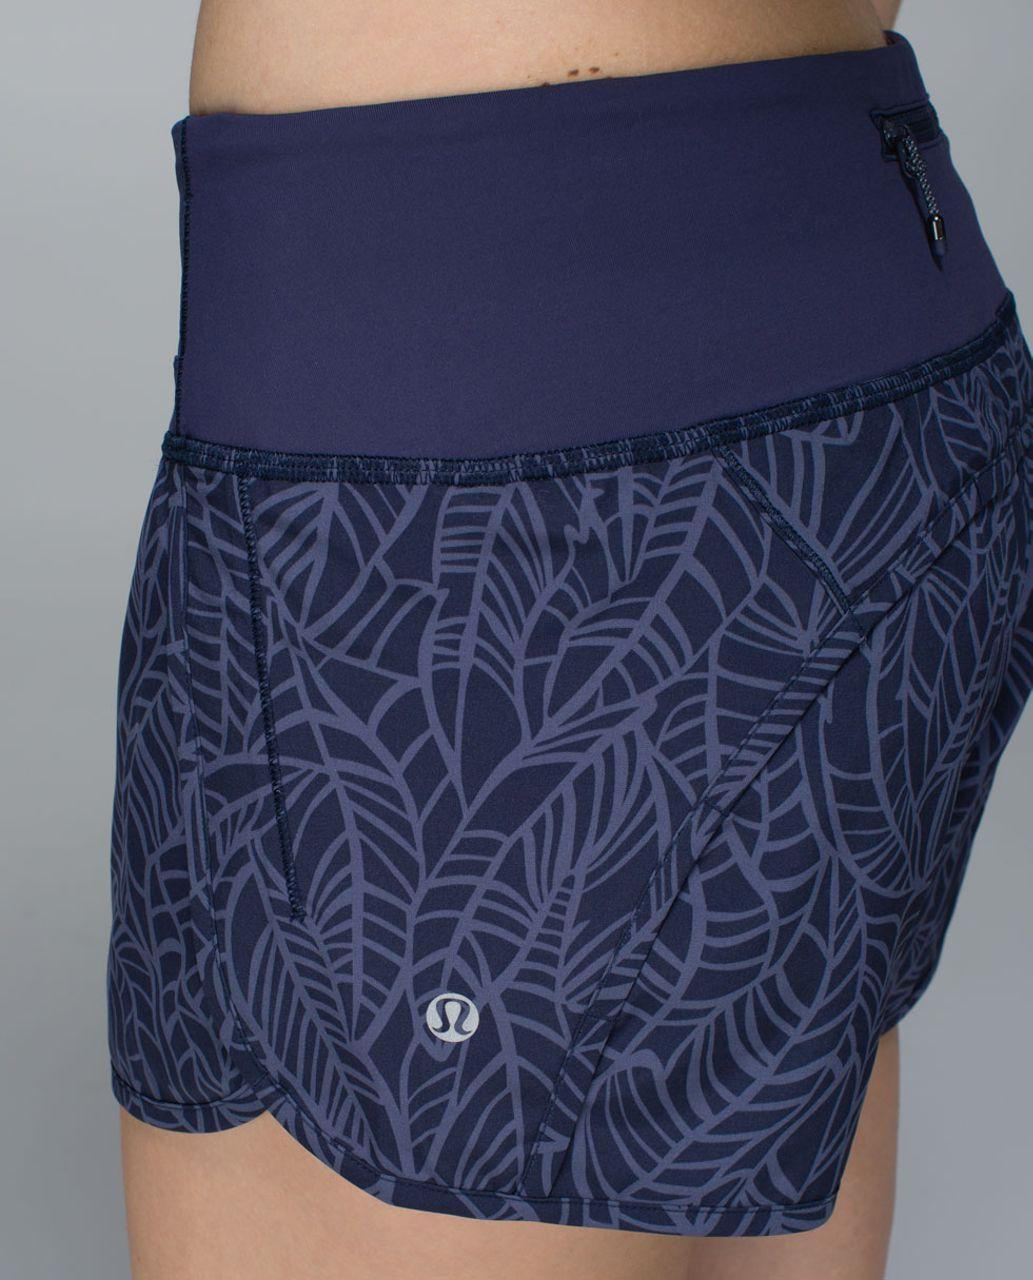 Lululemon Run Times Short *2-way stretch - Pretty Palm Cadet Greyvy / Cadet Blue